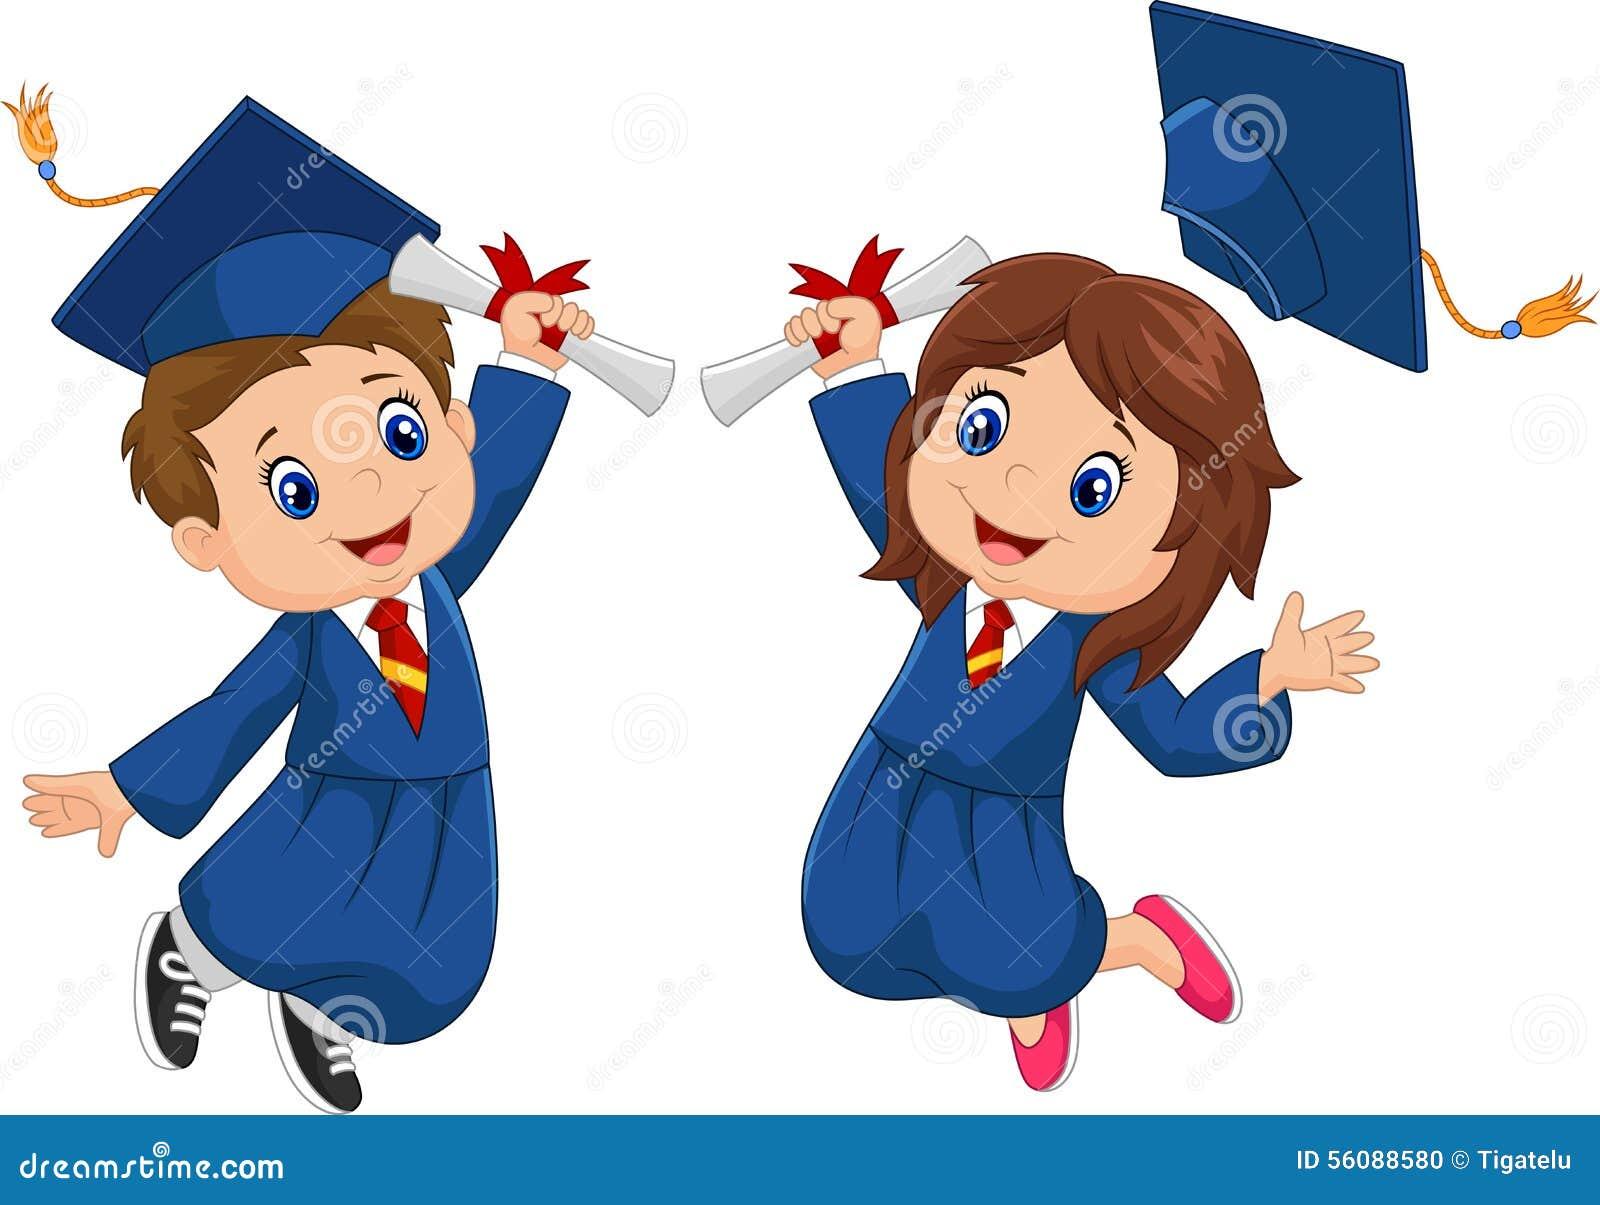 cartoon graduation celebration stock vector image 56088580 Graduation Cap and Gown Clip Art free graduation cap and diploma clipart